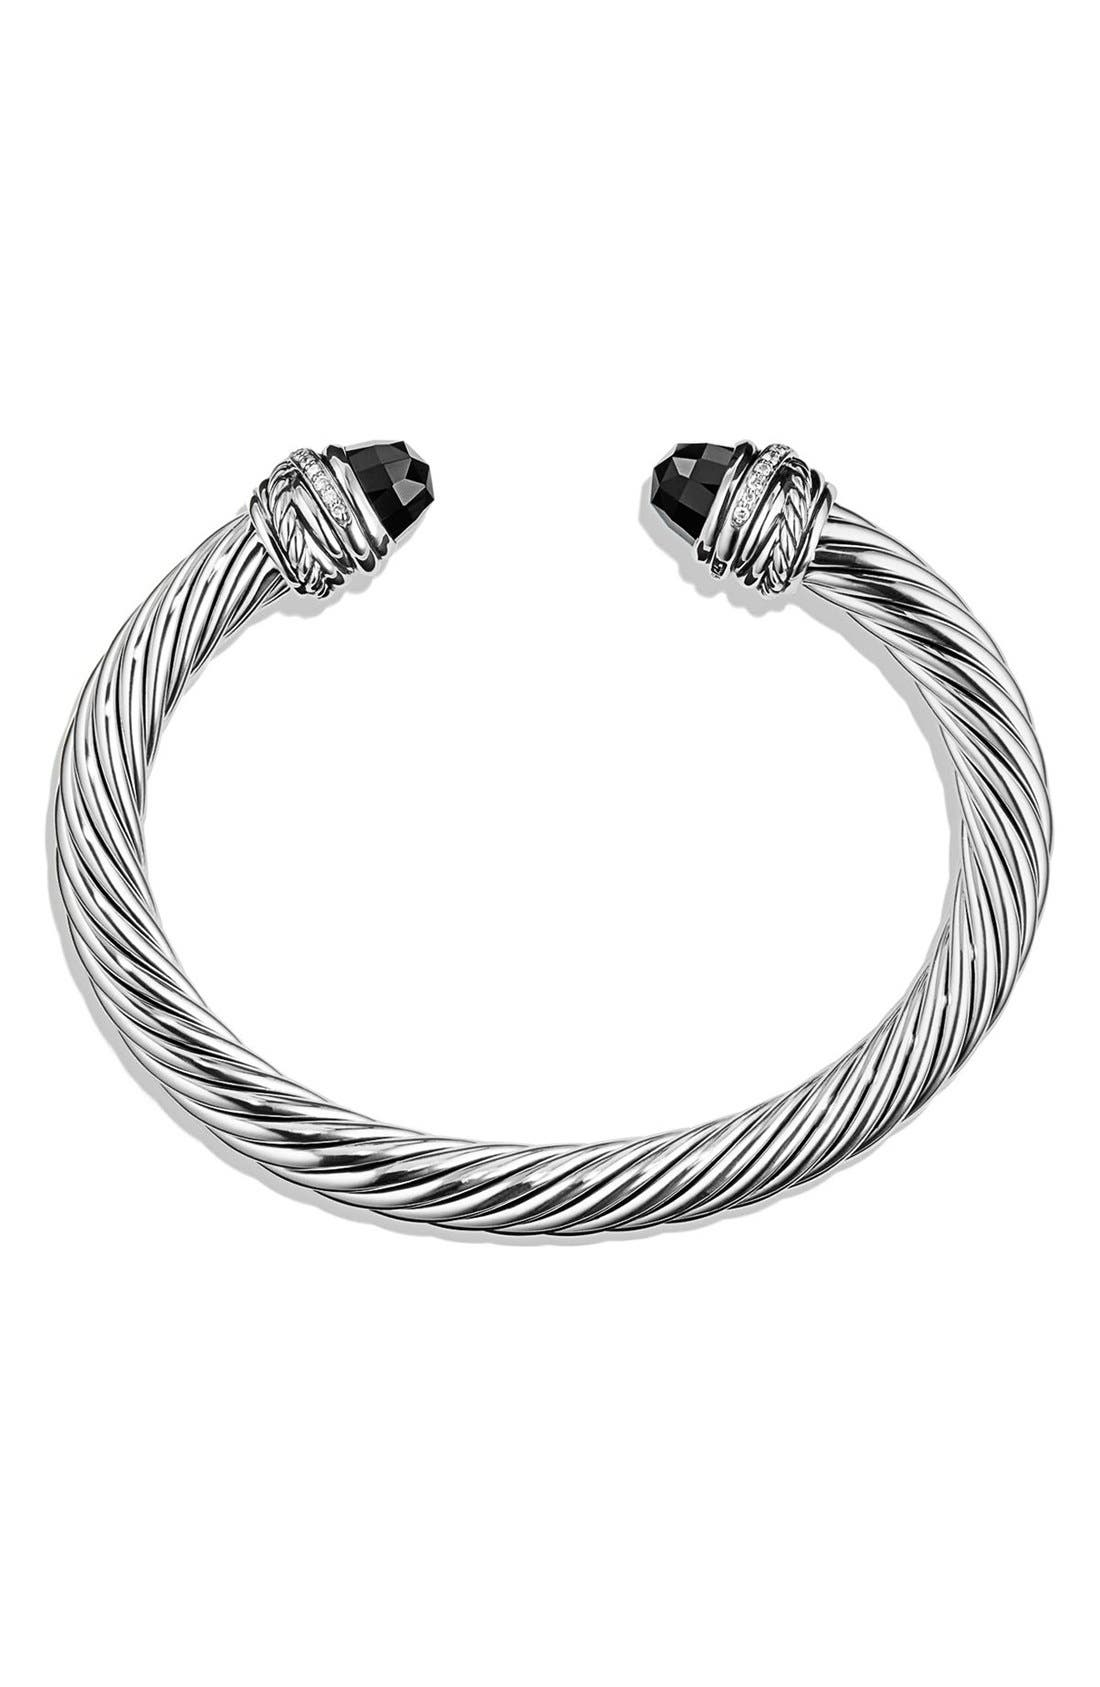 DAVID YURMAN, Crossover Bracelet with Diamonds, 7mm, Alternate thumbnail 3, color, BLACK ONYX